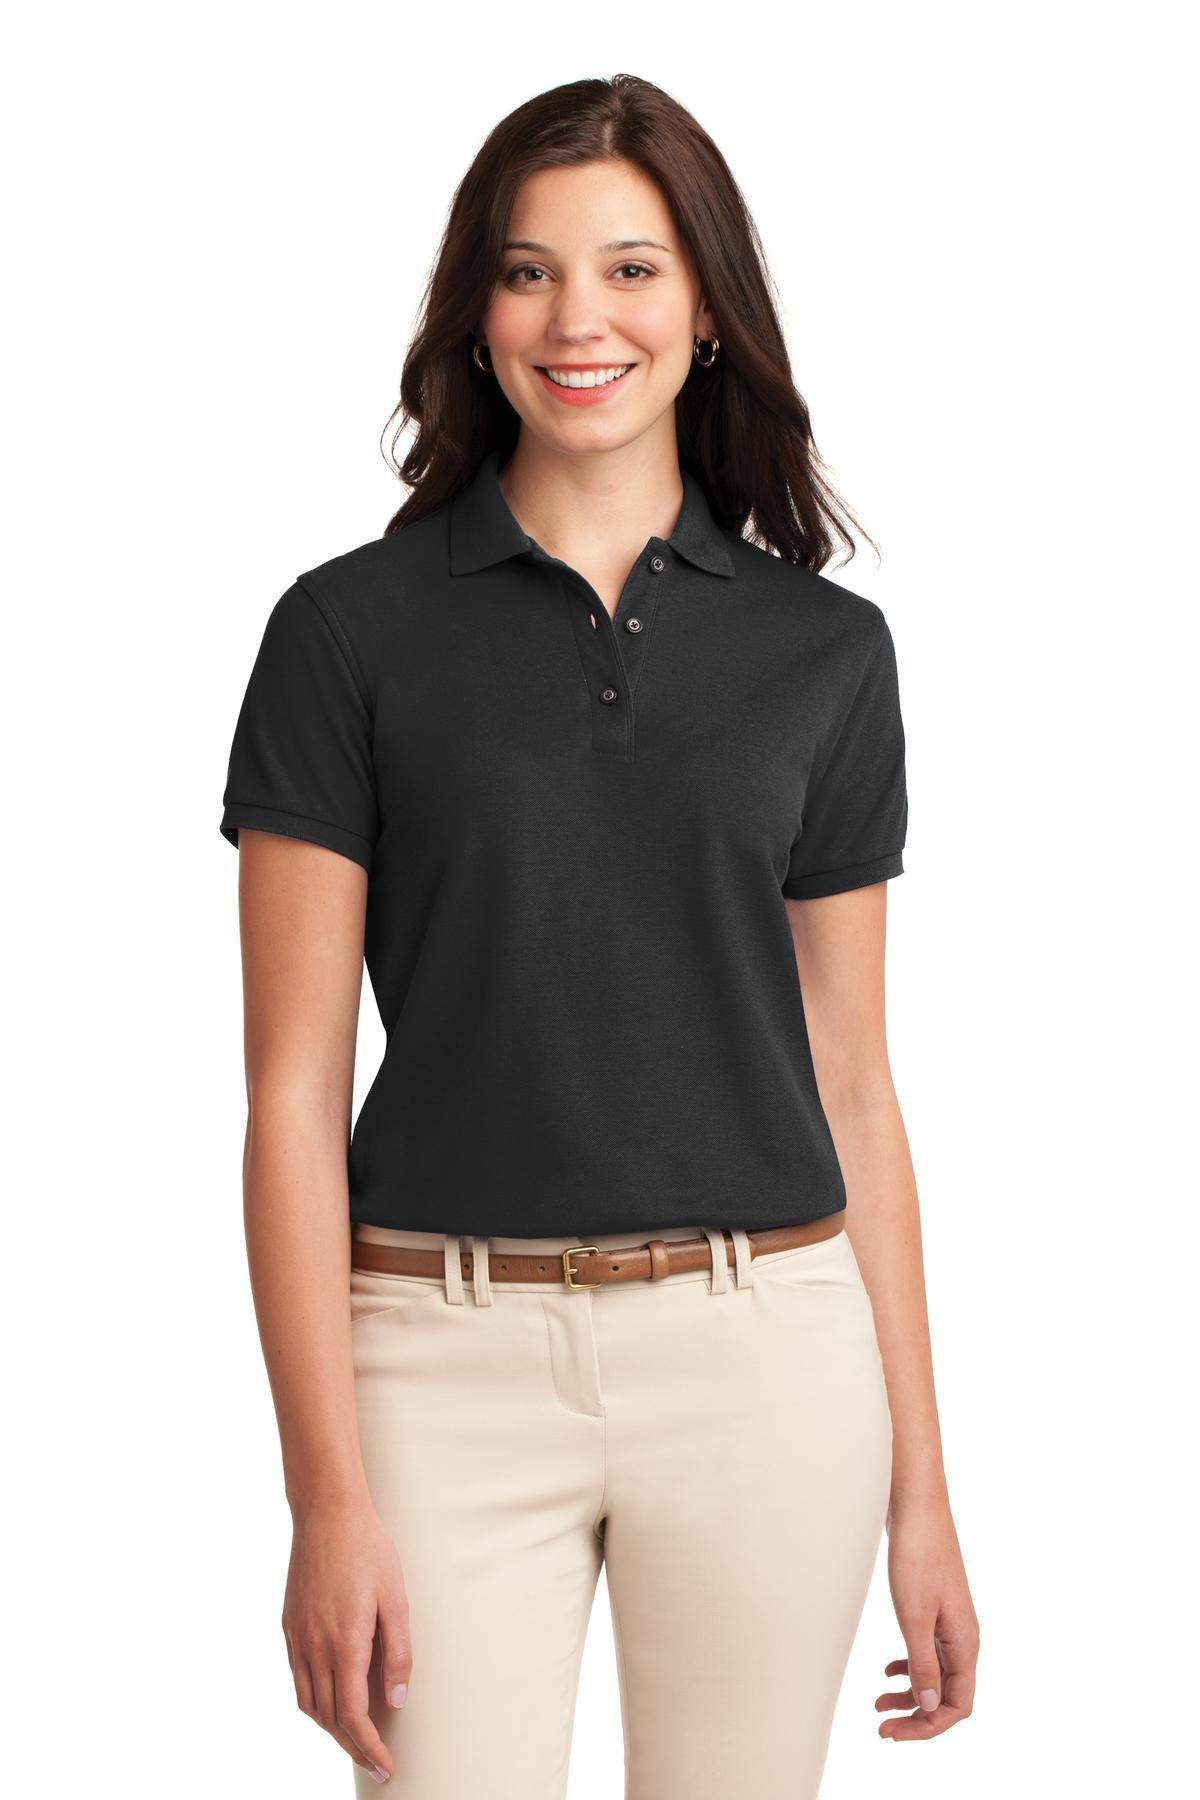 Port Authority Women's Silk Touch Polo XXL Black